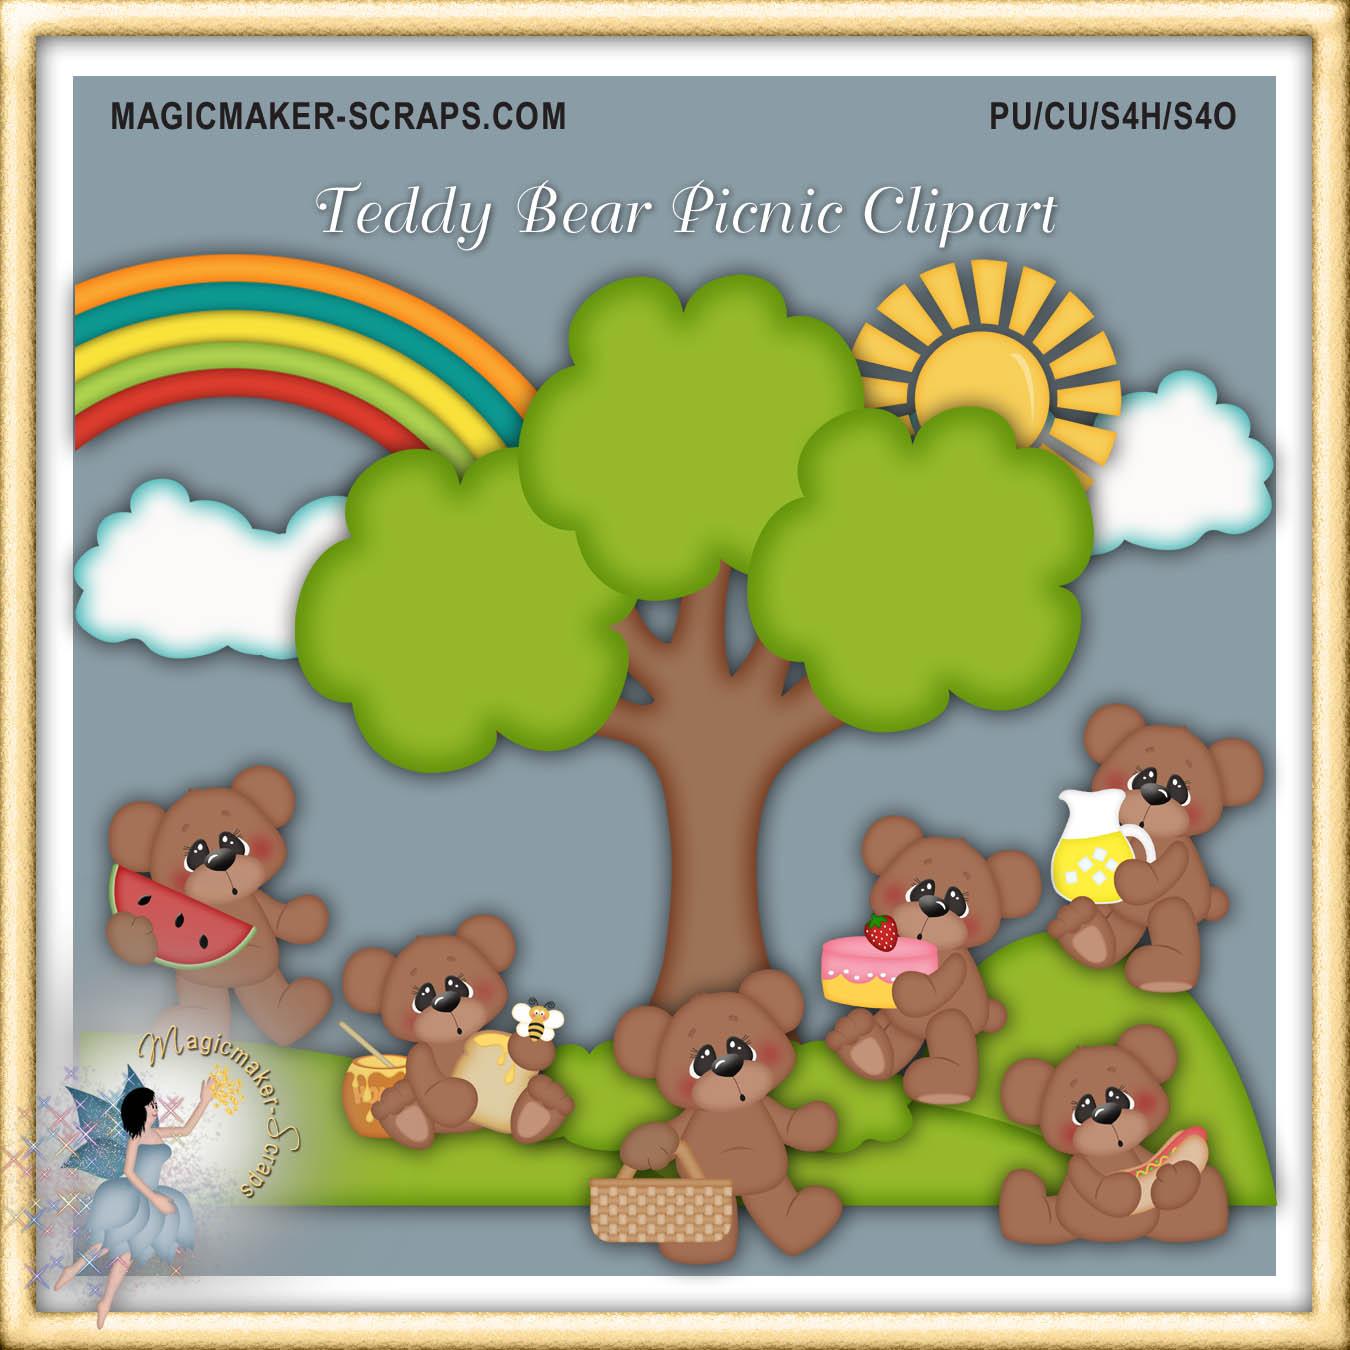 Picnic clipart teddy bear picnic #11